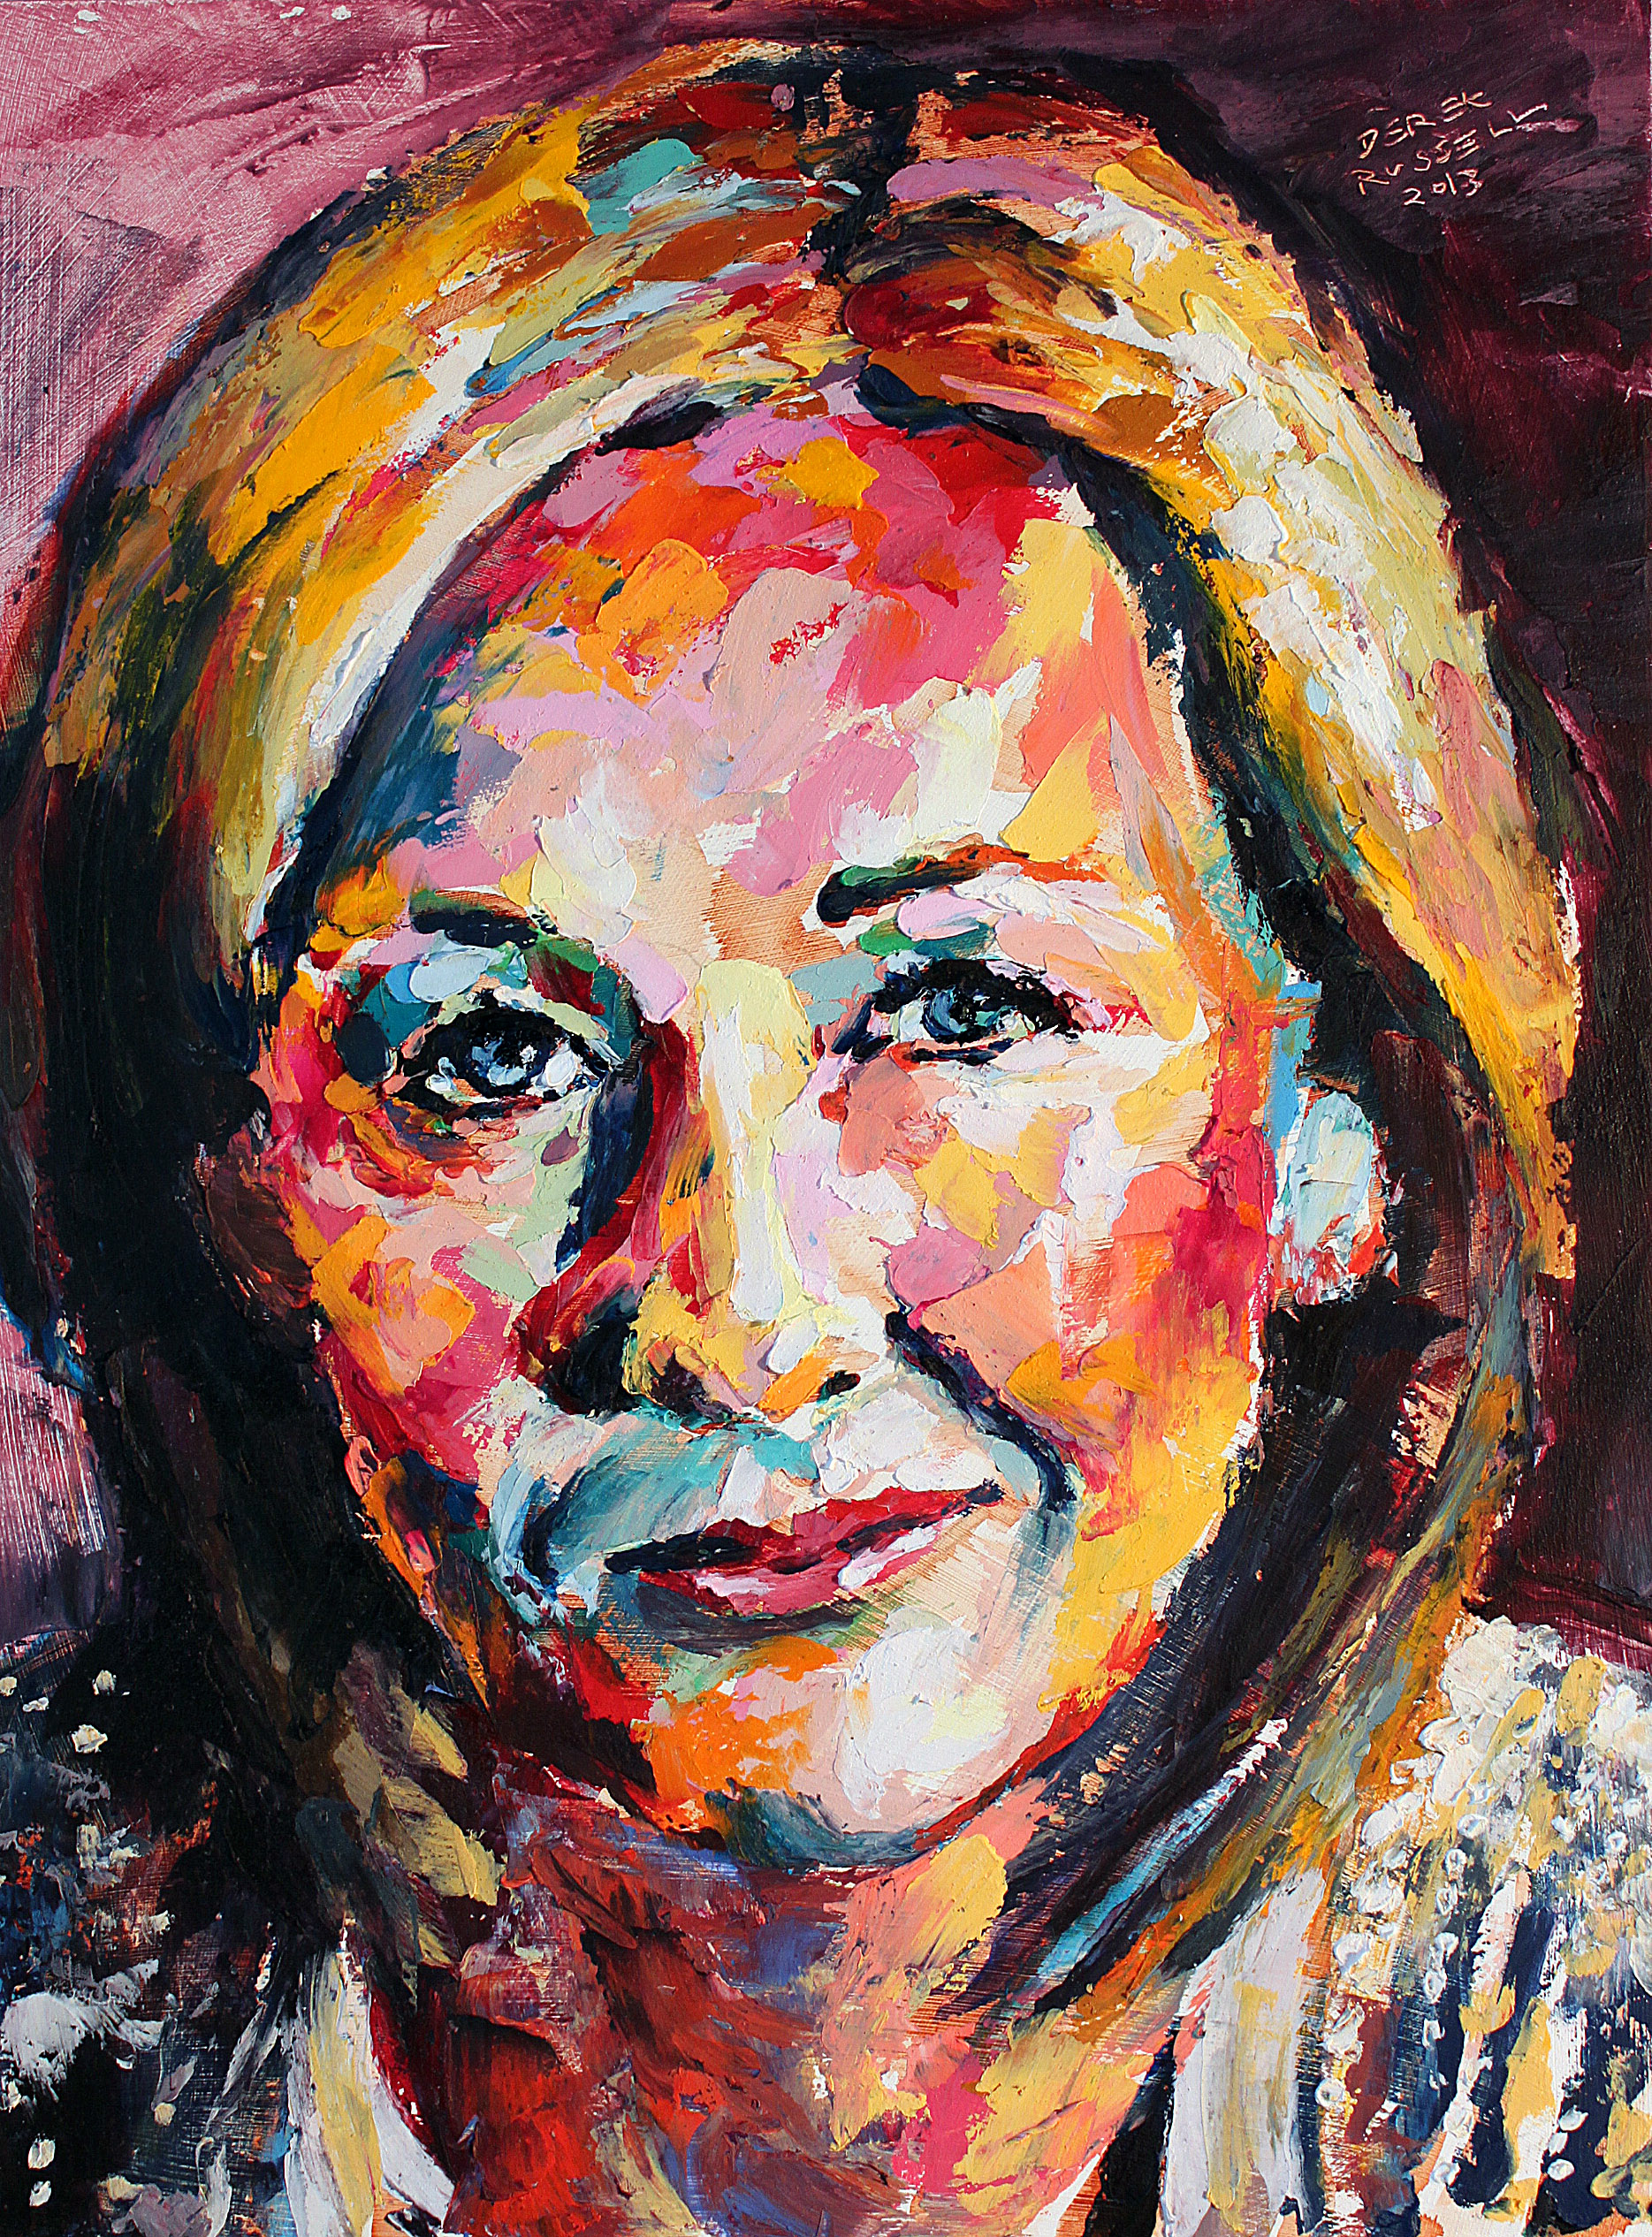 J.K. Rowling Original Portrait Pop Art Painting by Derek Russell